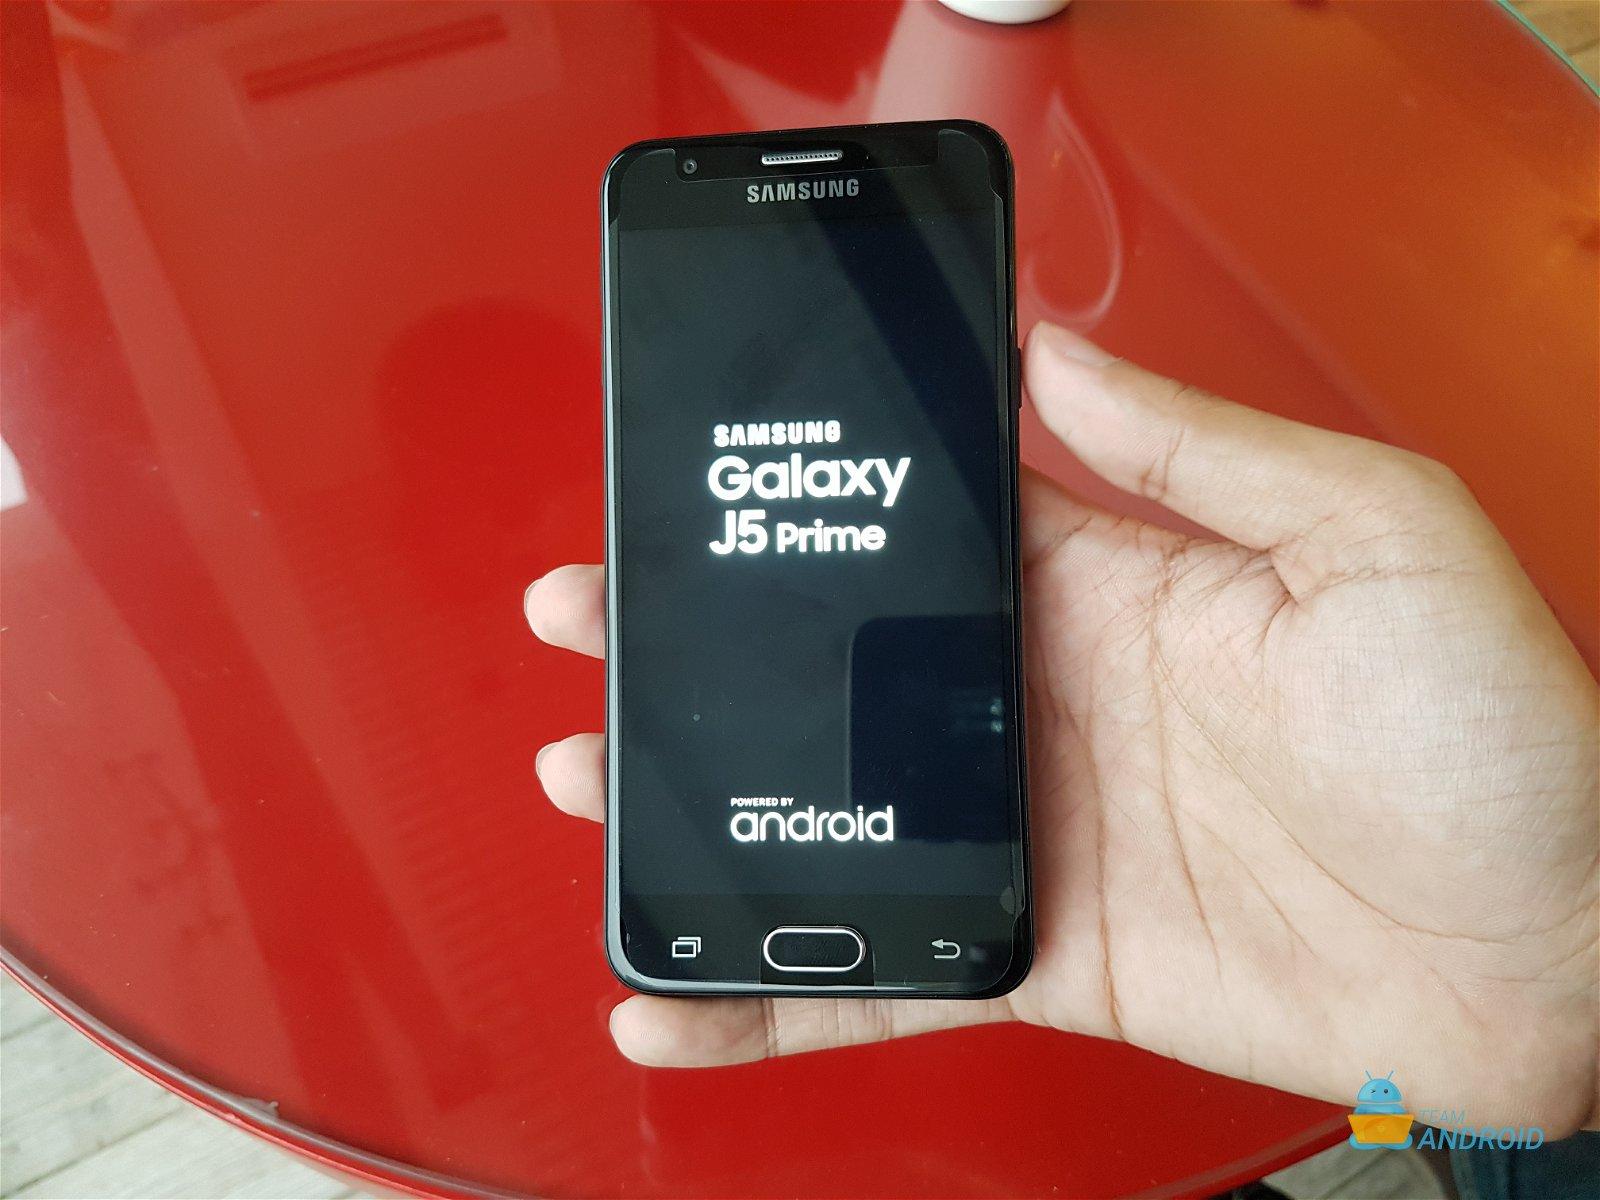 Samsung Galaxy J5 Prime Review